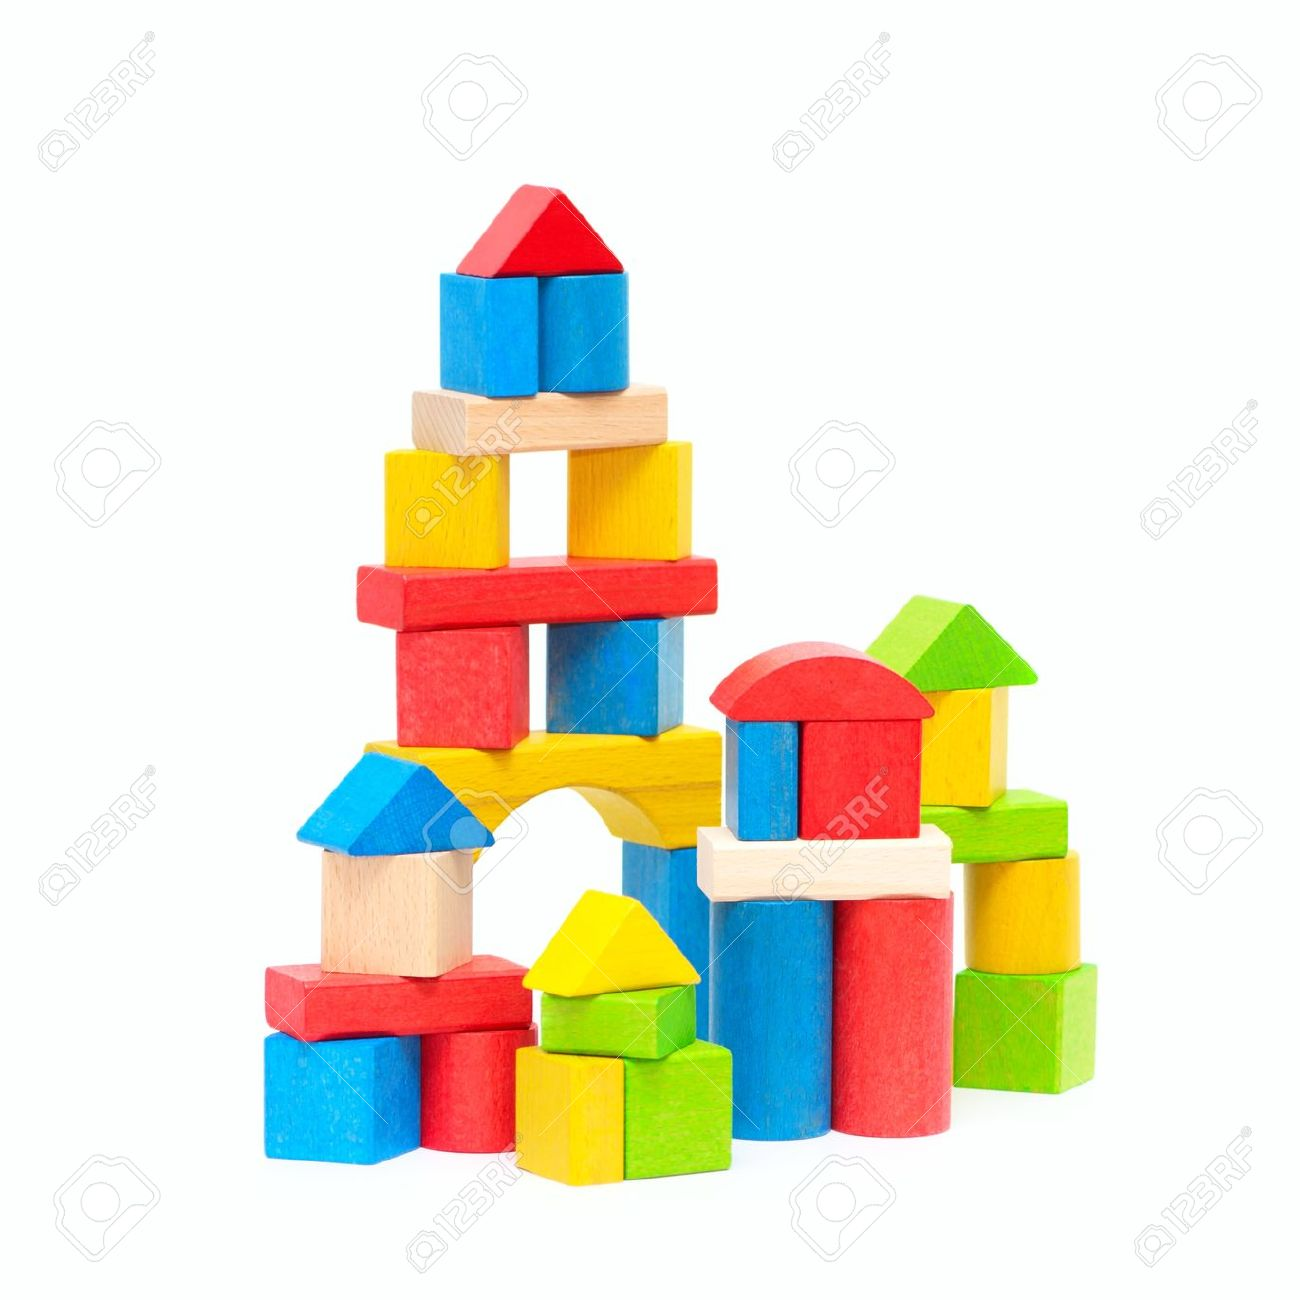 1300x1300 Wooden Building Blocks Clipart